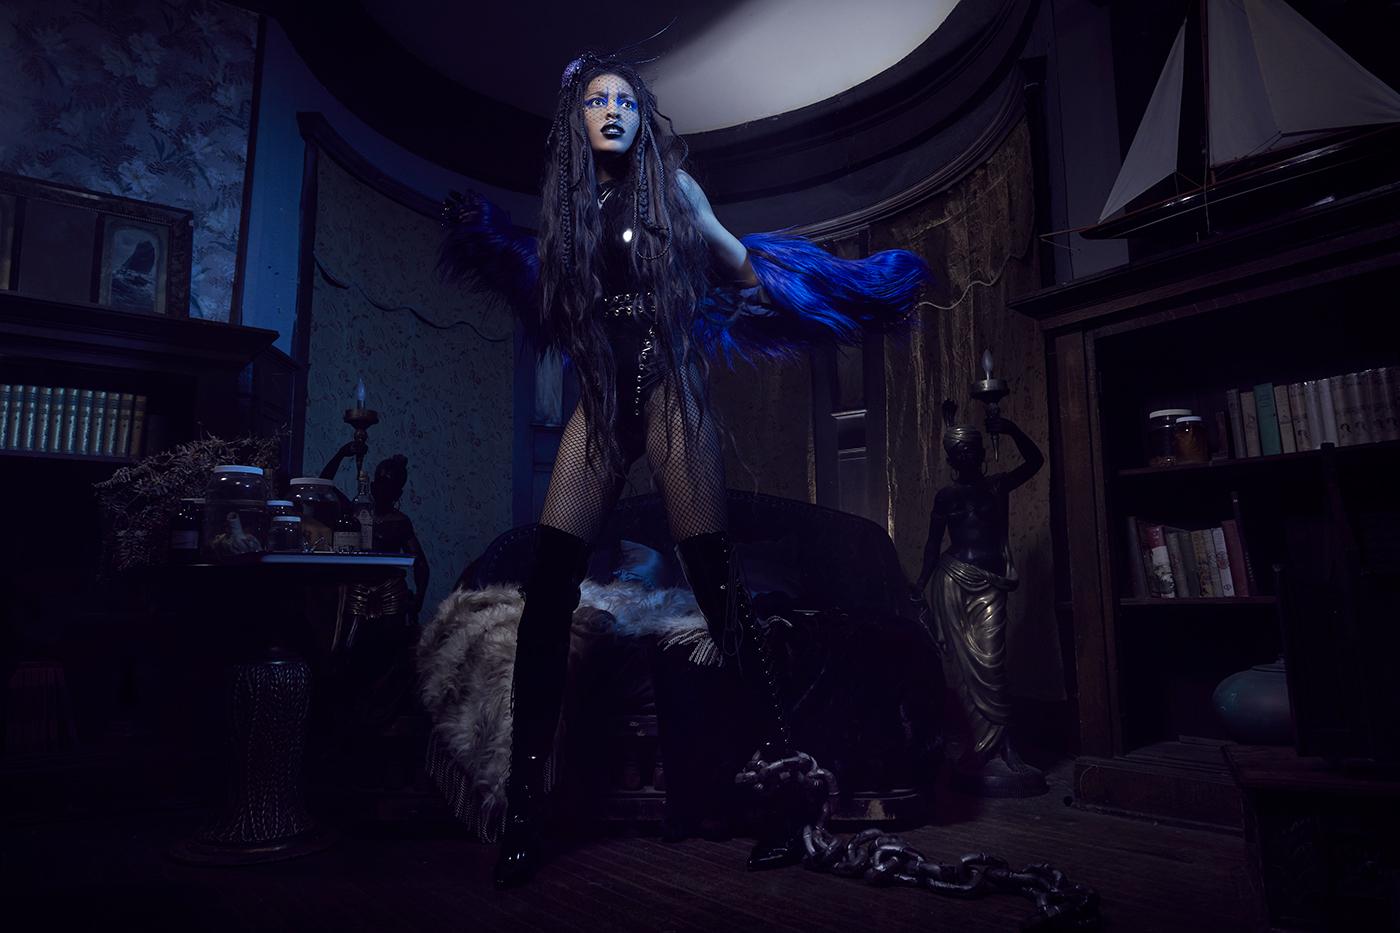 horror story / фото Екатерина Белинская - Ekaterina Belinskaya